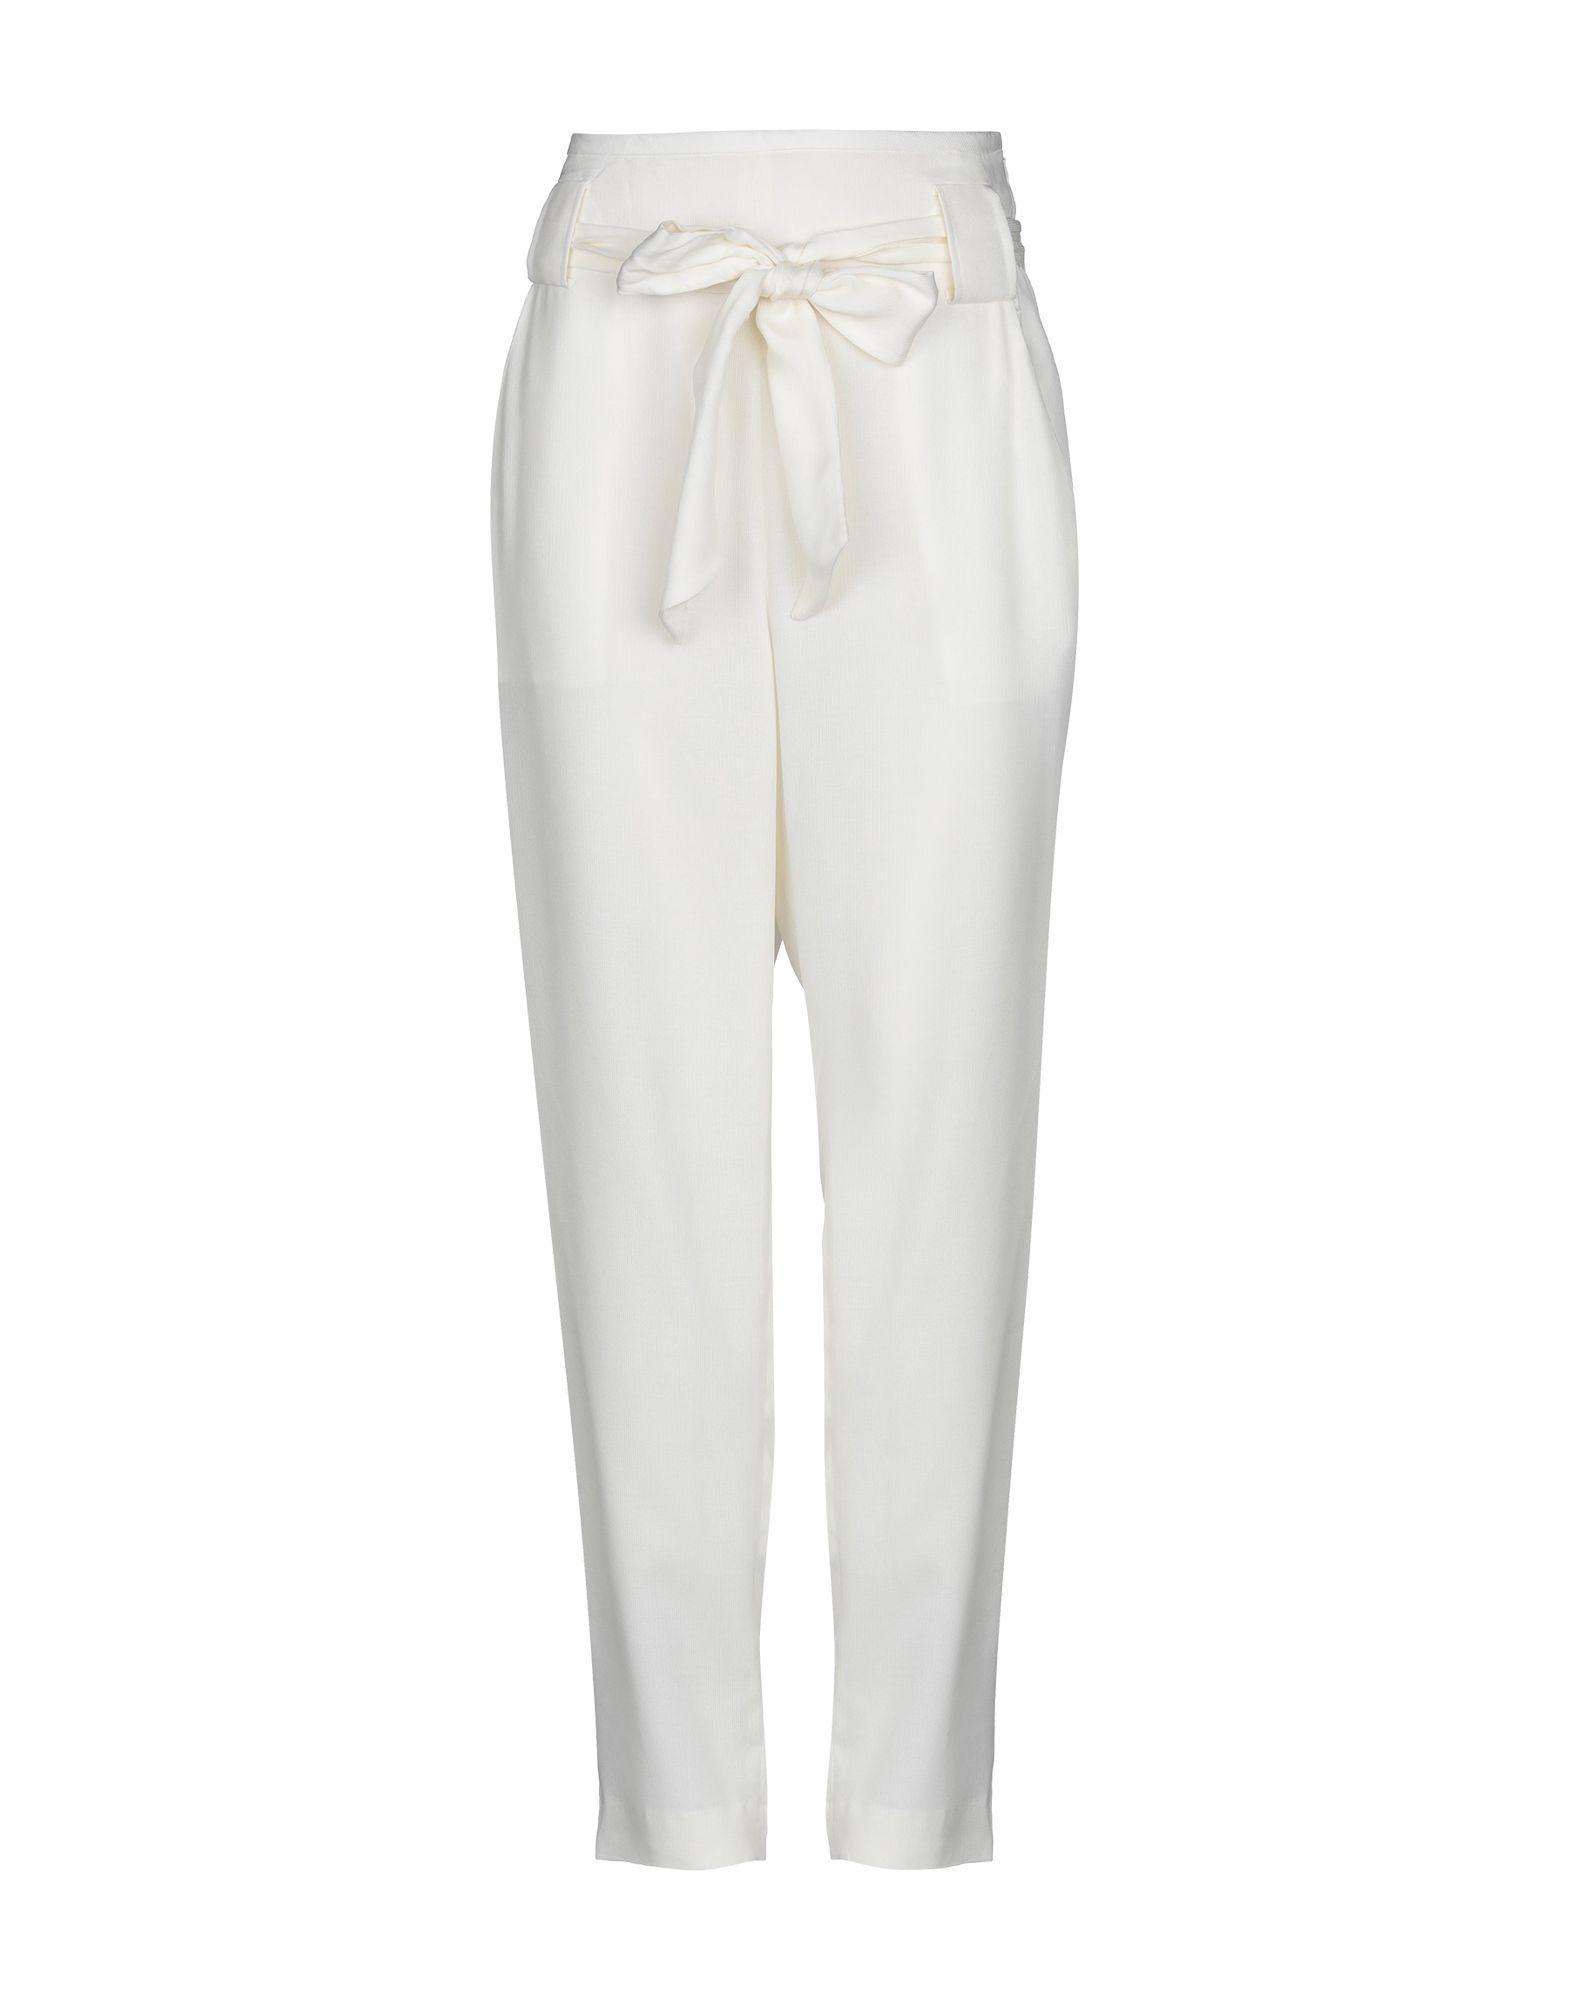 Pantalon En Lyst Coloris Iro Blanc QdoerCBWx